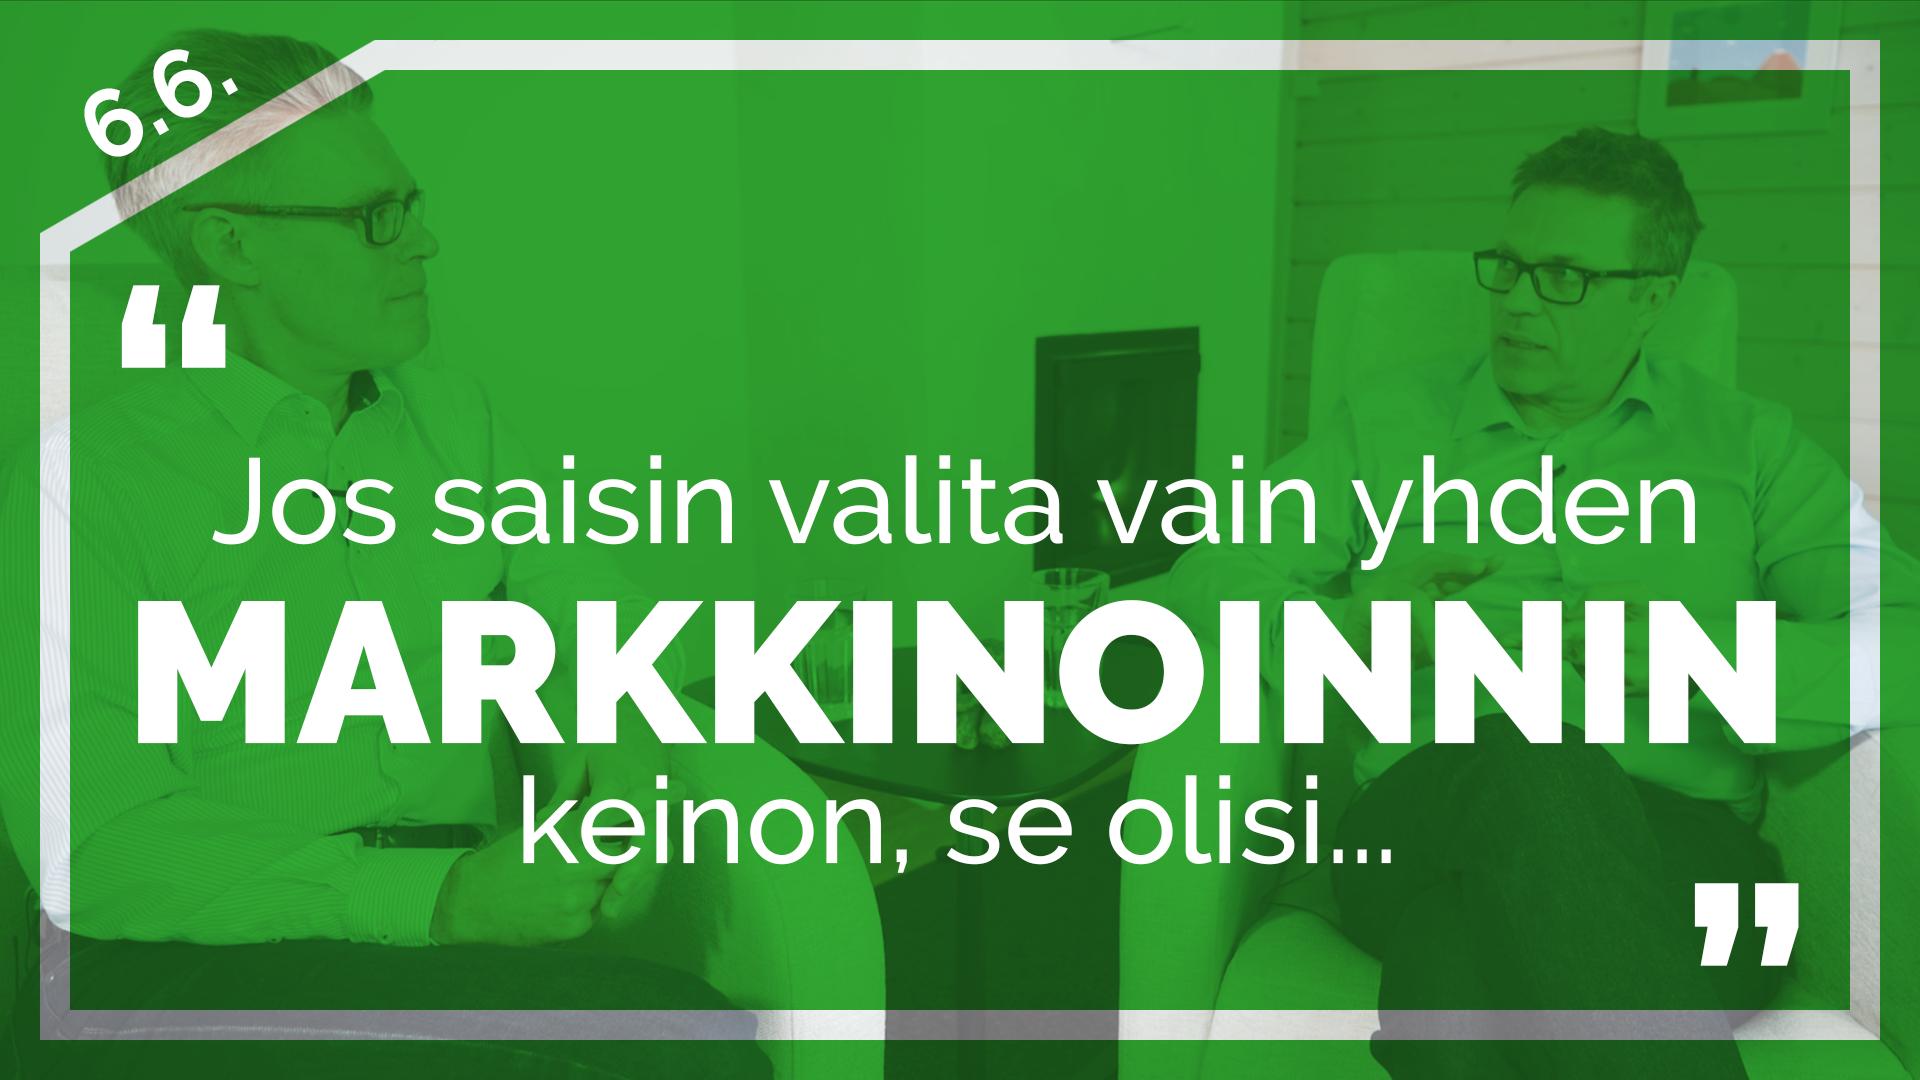 parantainen-sarasvuo-video4-pvm.png